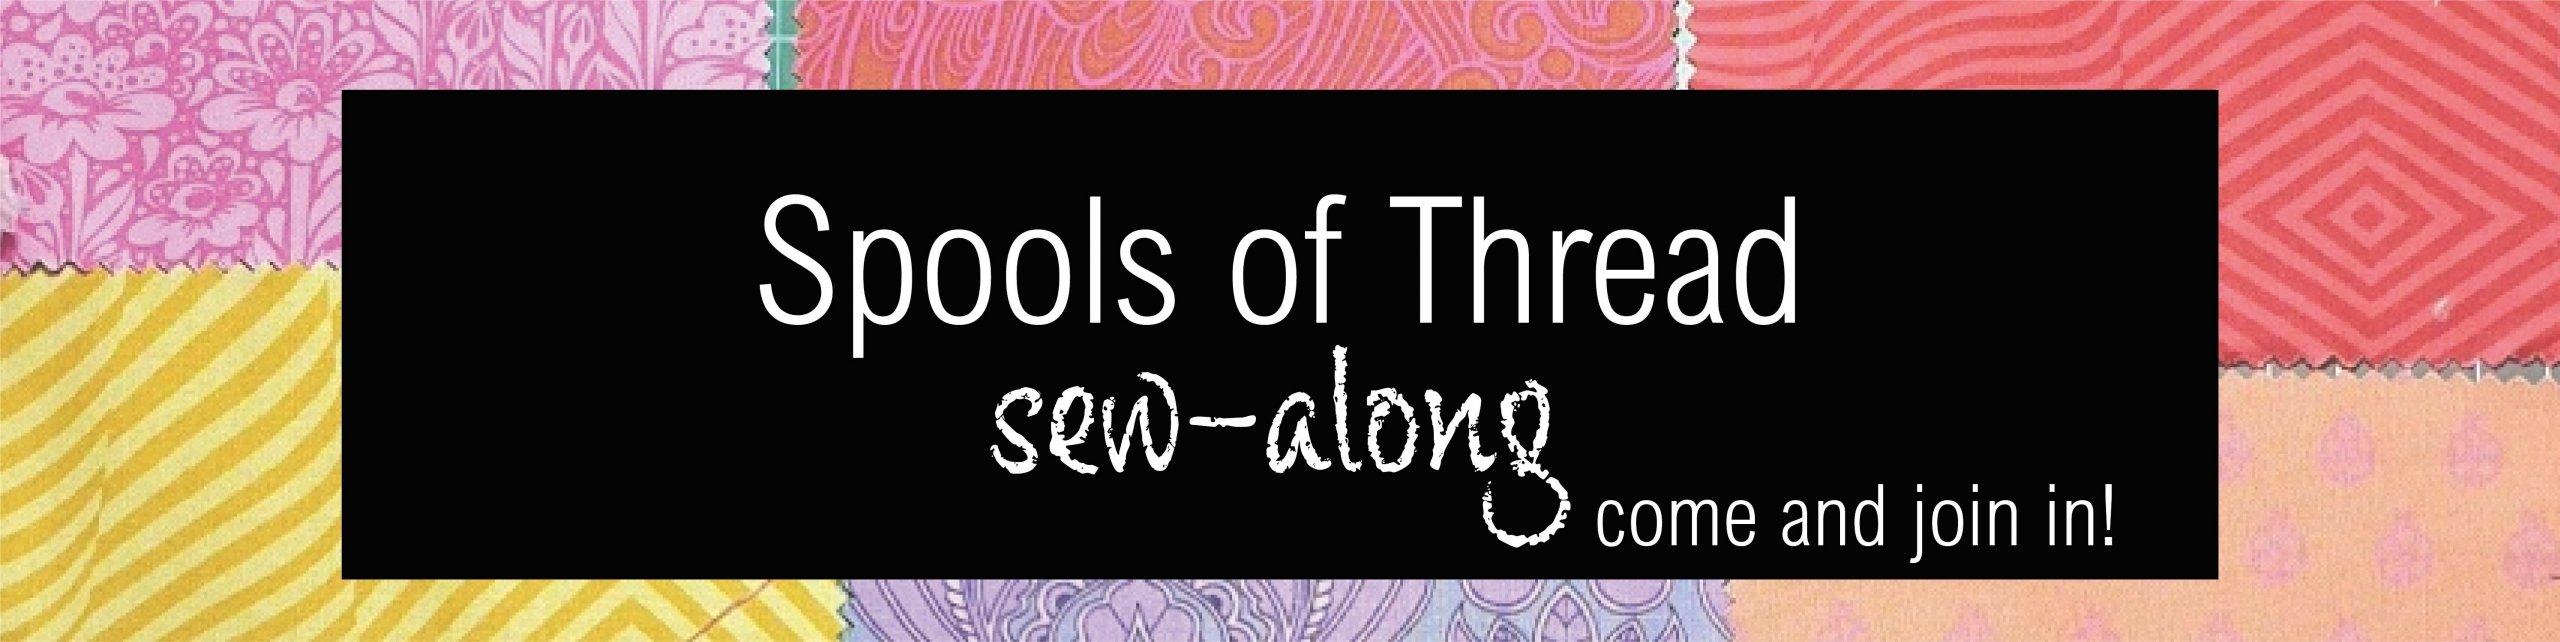 Spools of Thread Sew Along